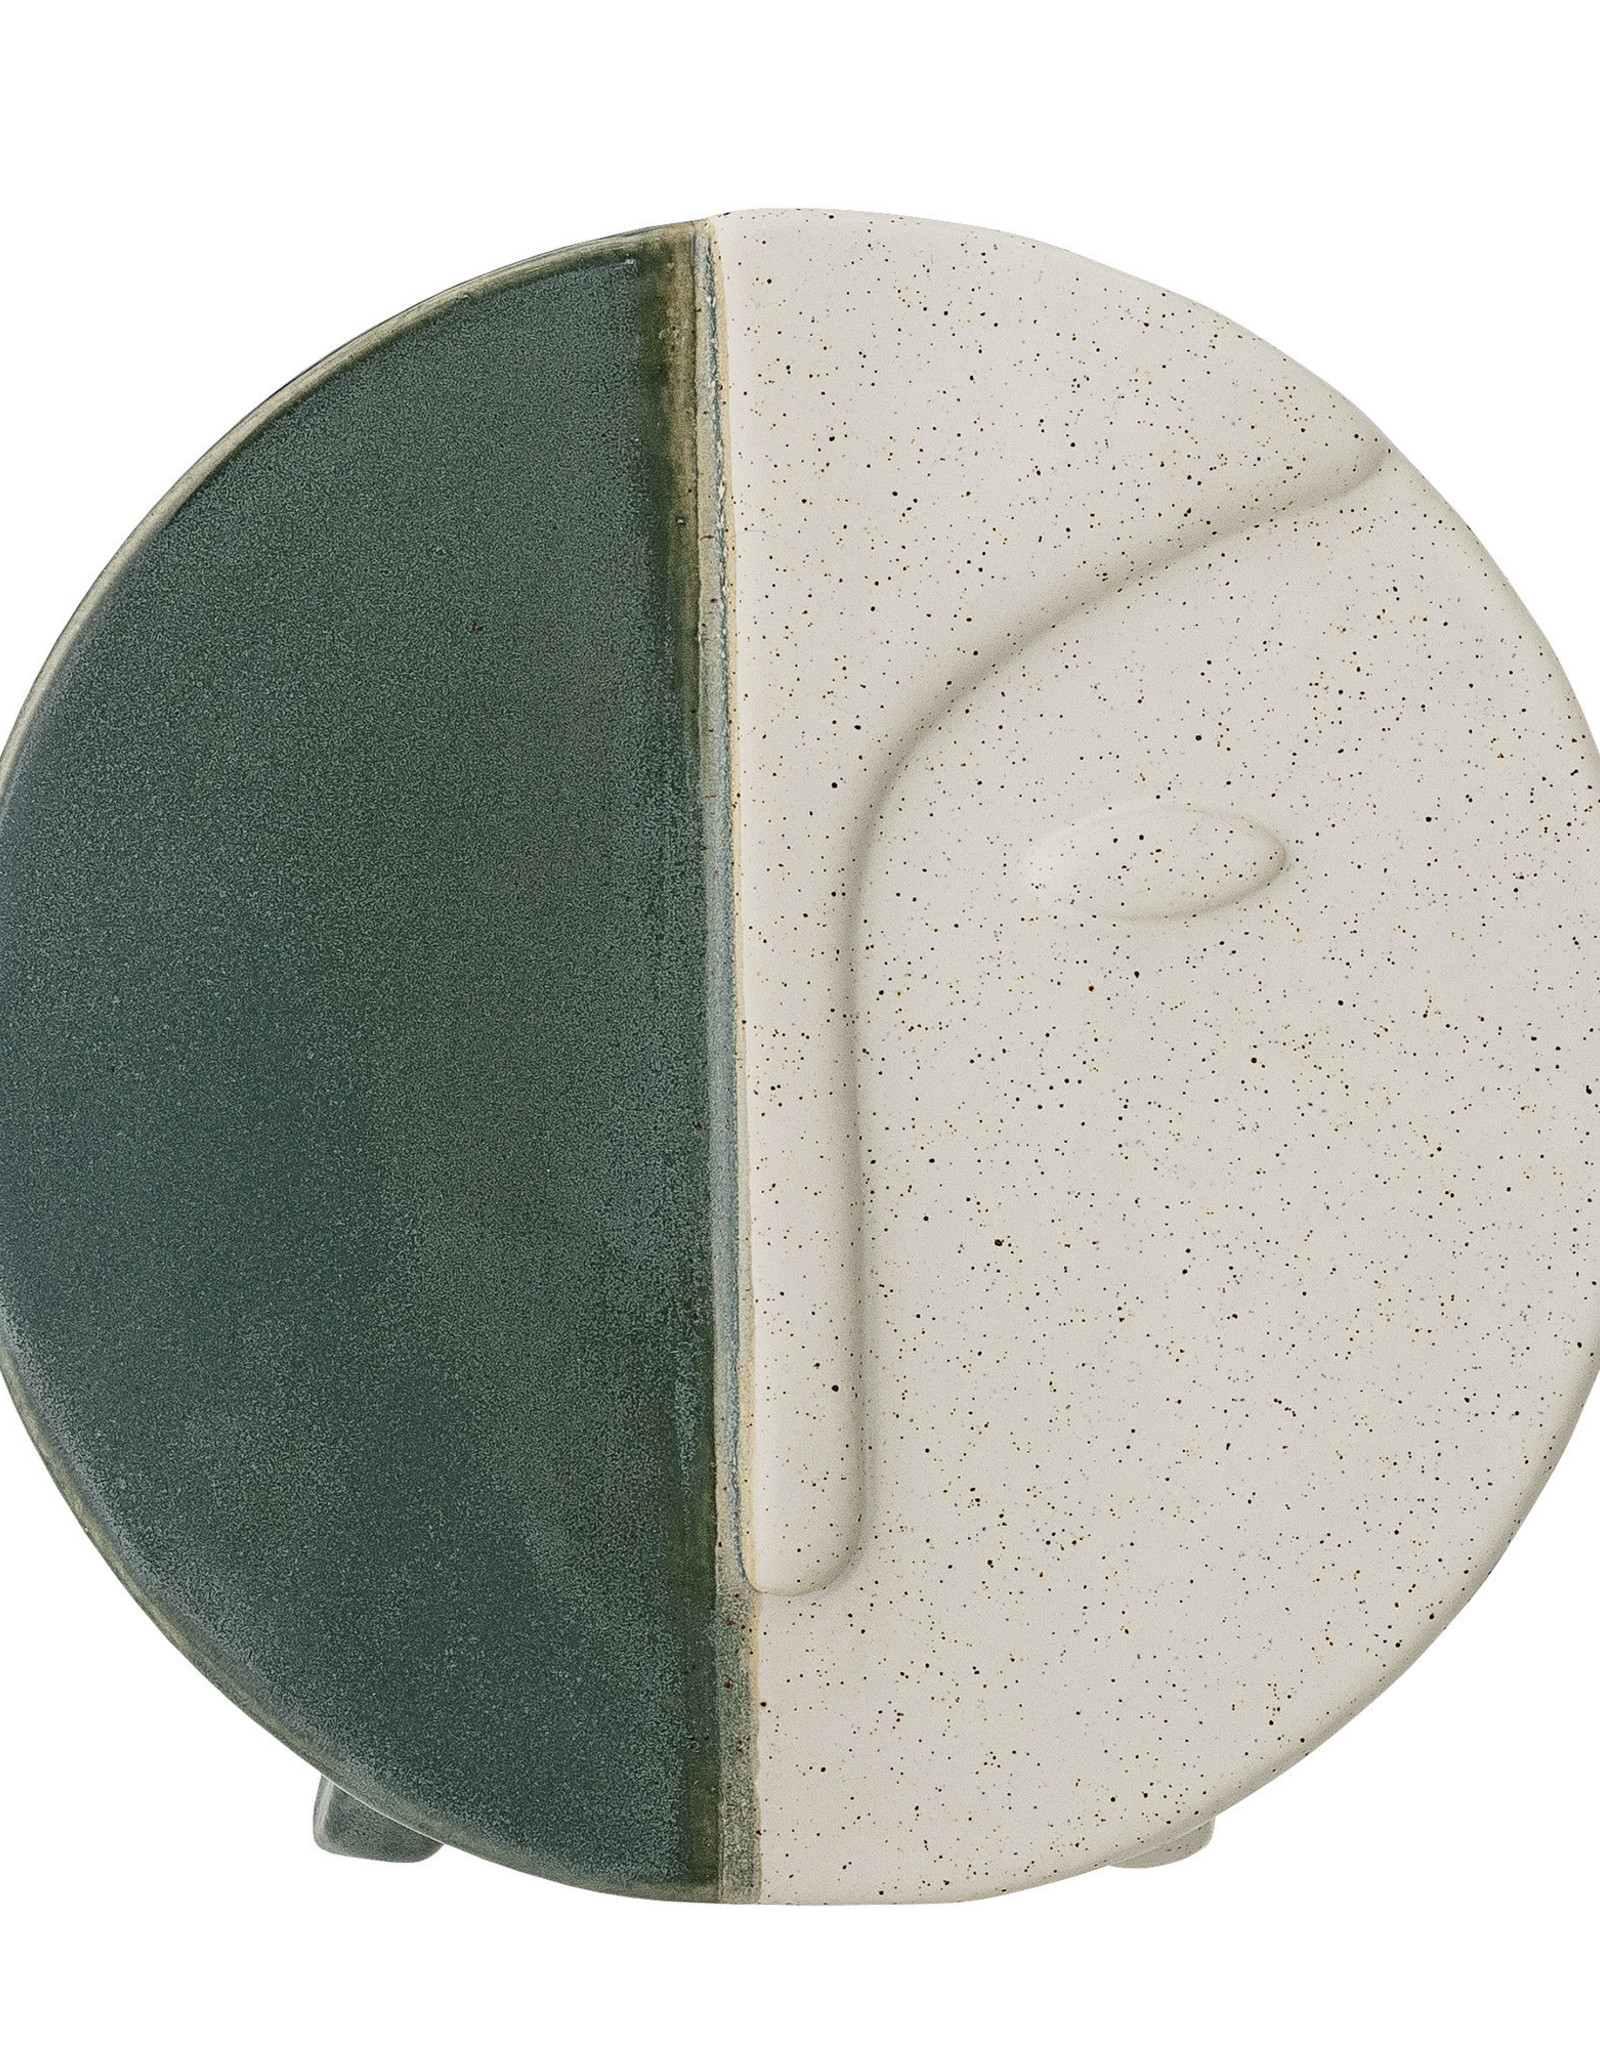 Bloomingville Bloomingville - Wall vase green stoneware